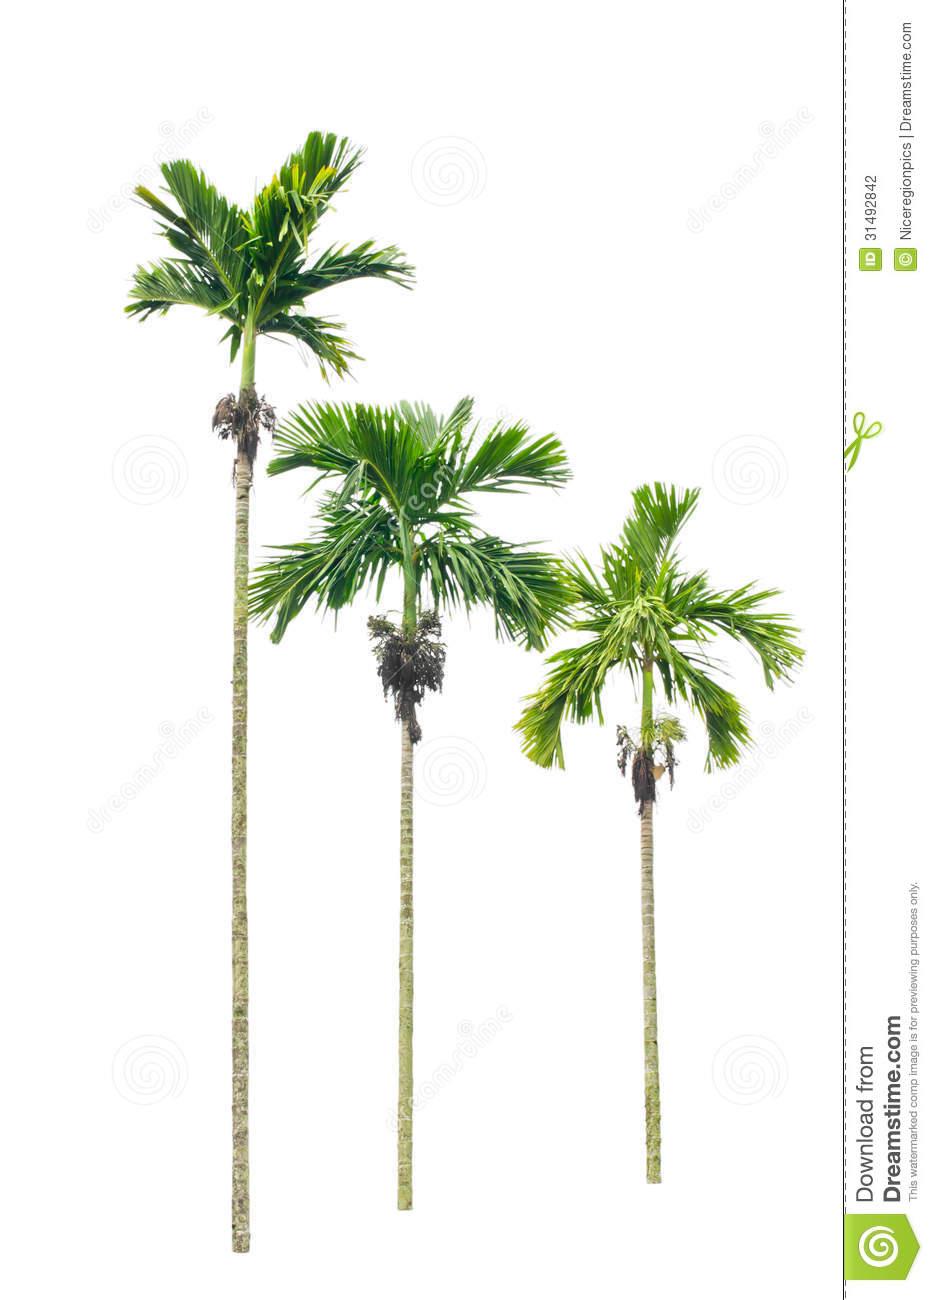 Betel Palm Tree. Stock Photography.